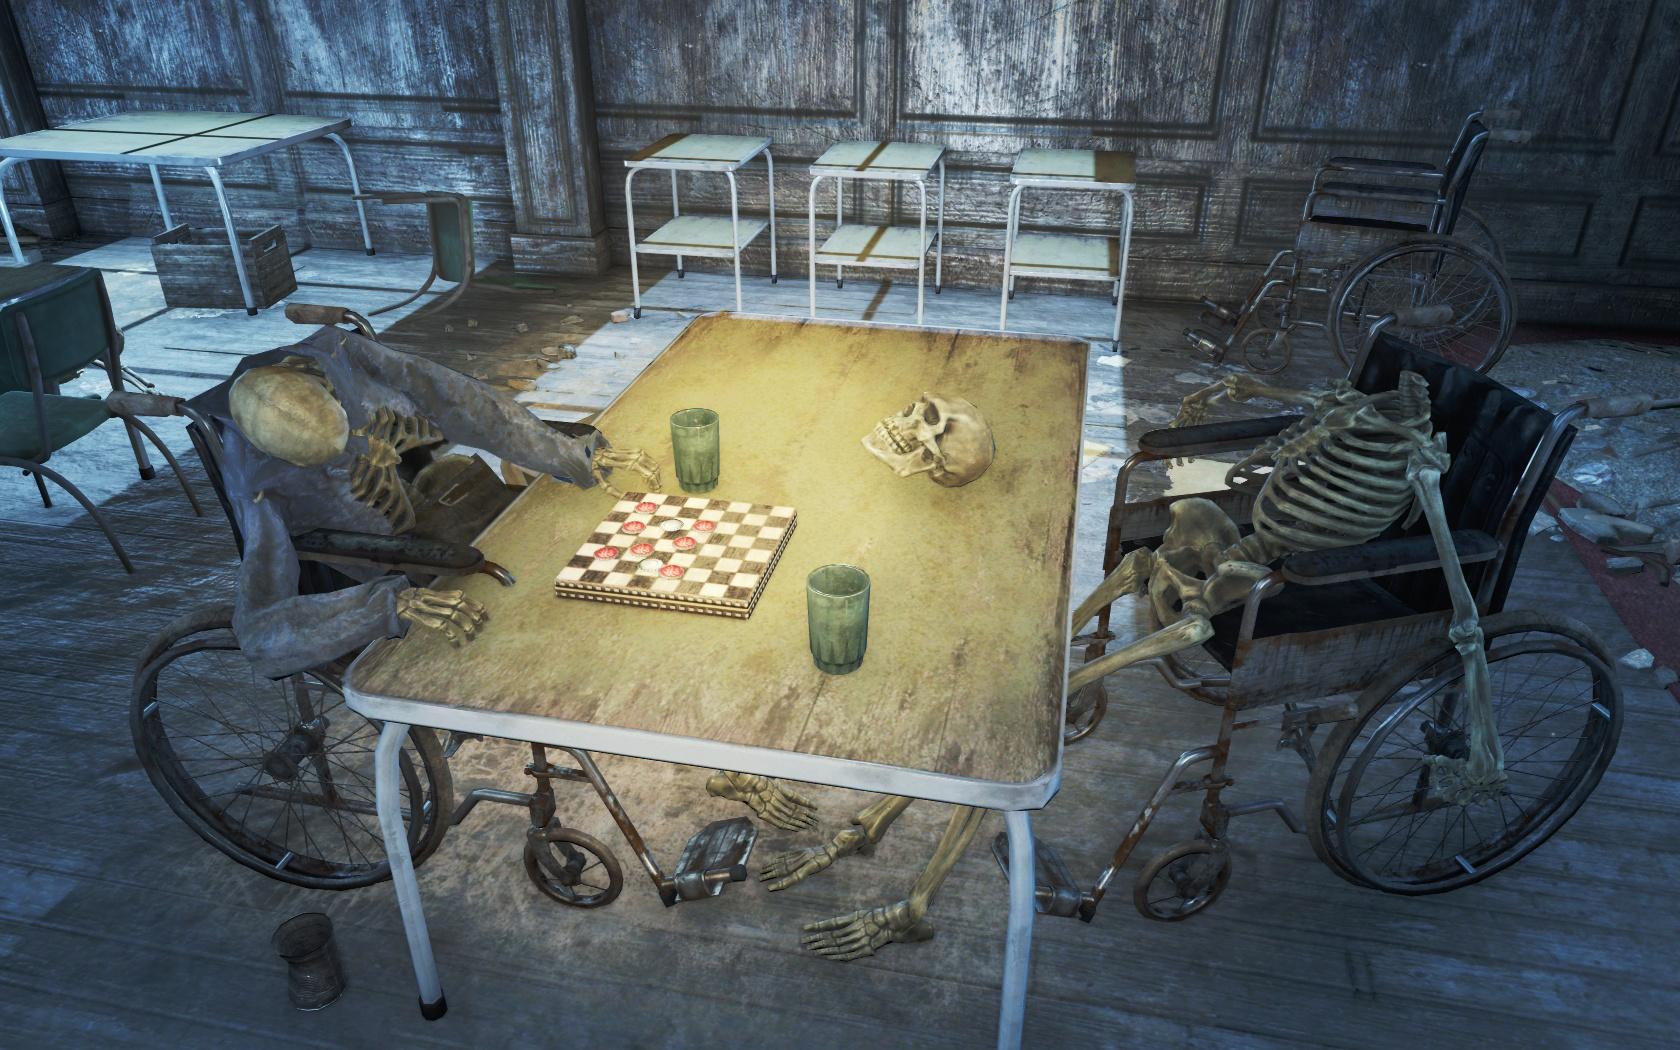 На кон голову поставил (Санаторий Сэнди-Коувс) - Fallout 4 Санаторий, Санаторий Сэнди-Коувс, скелет, Сэнди-Коувс